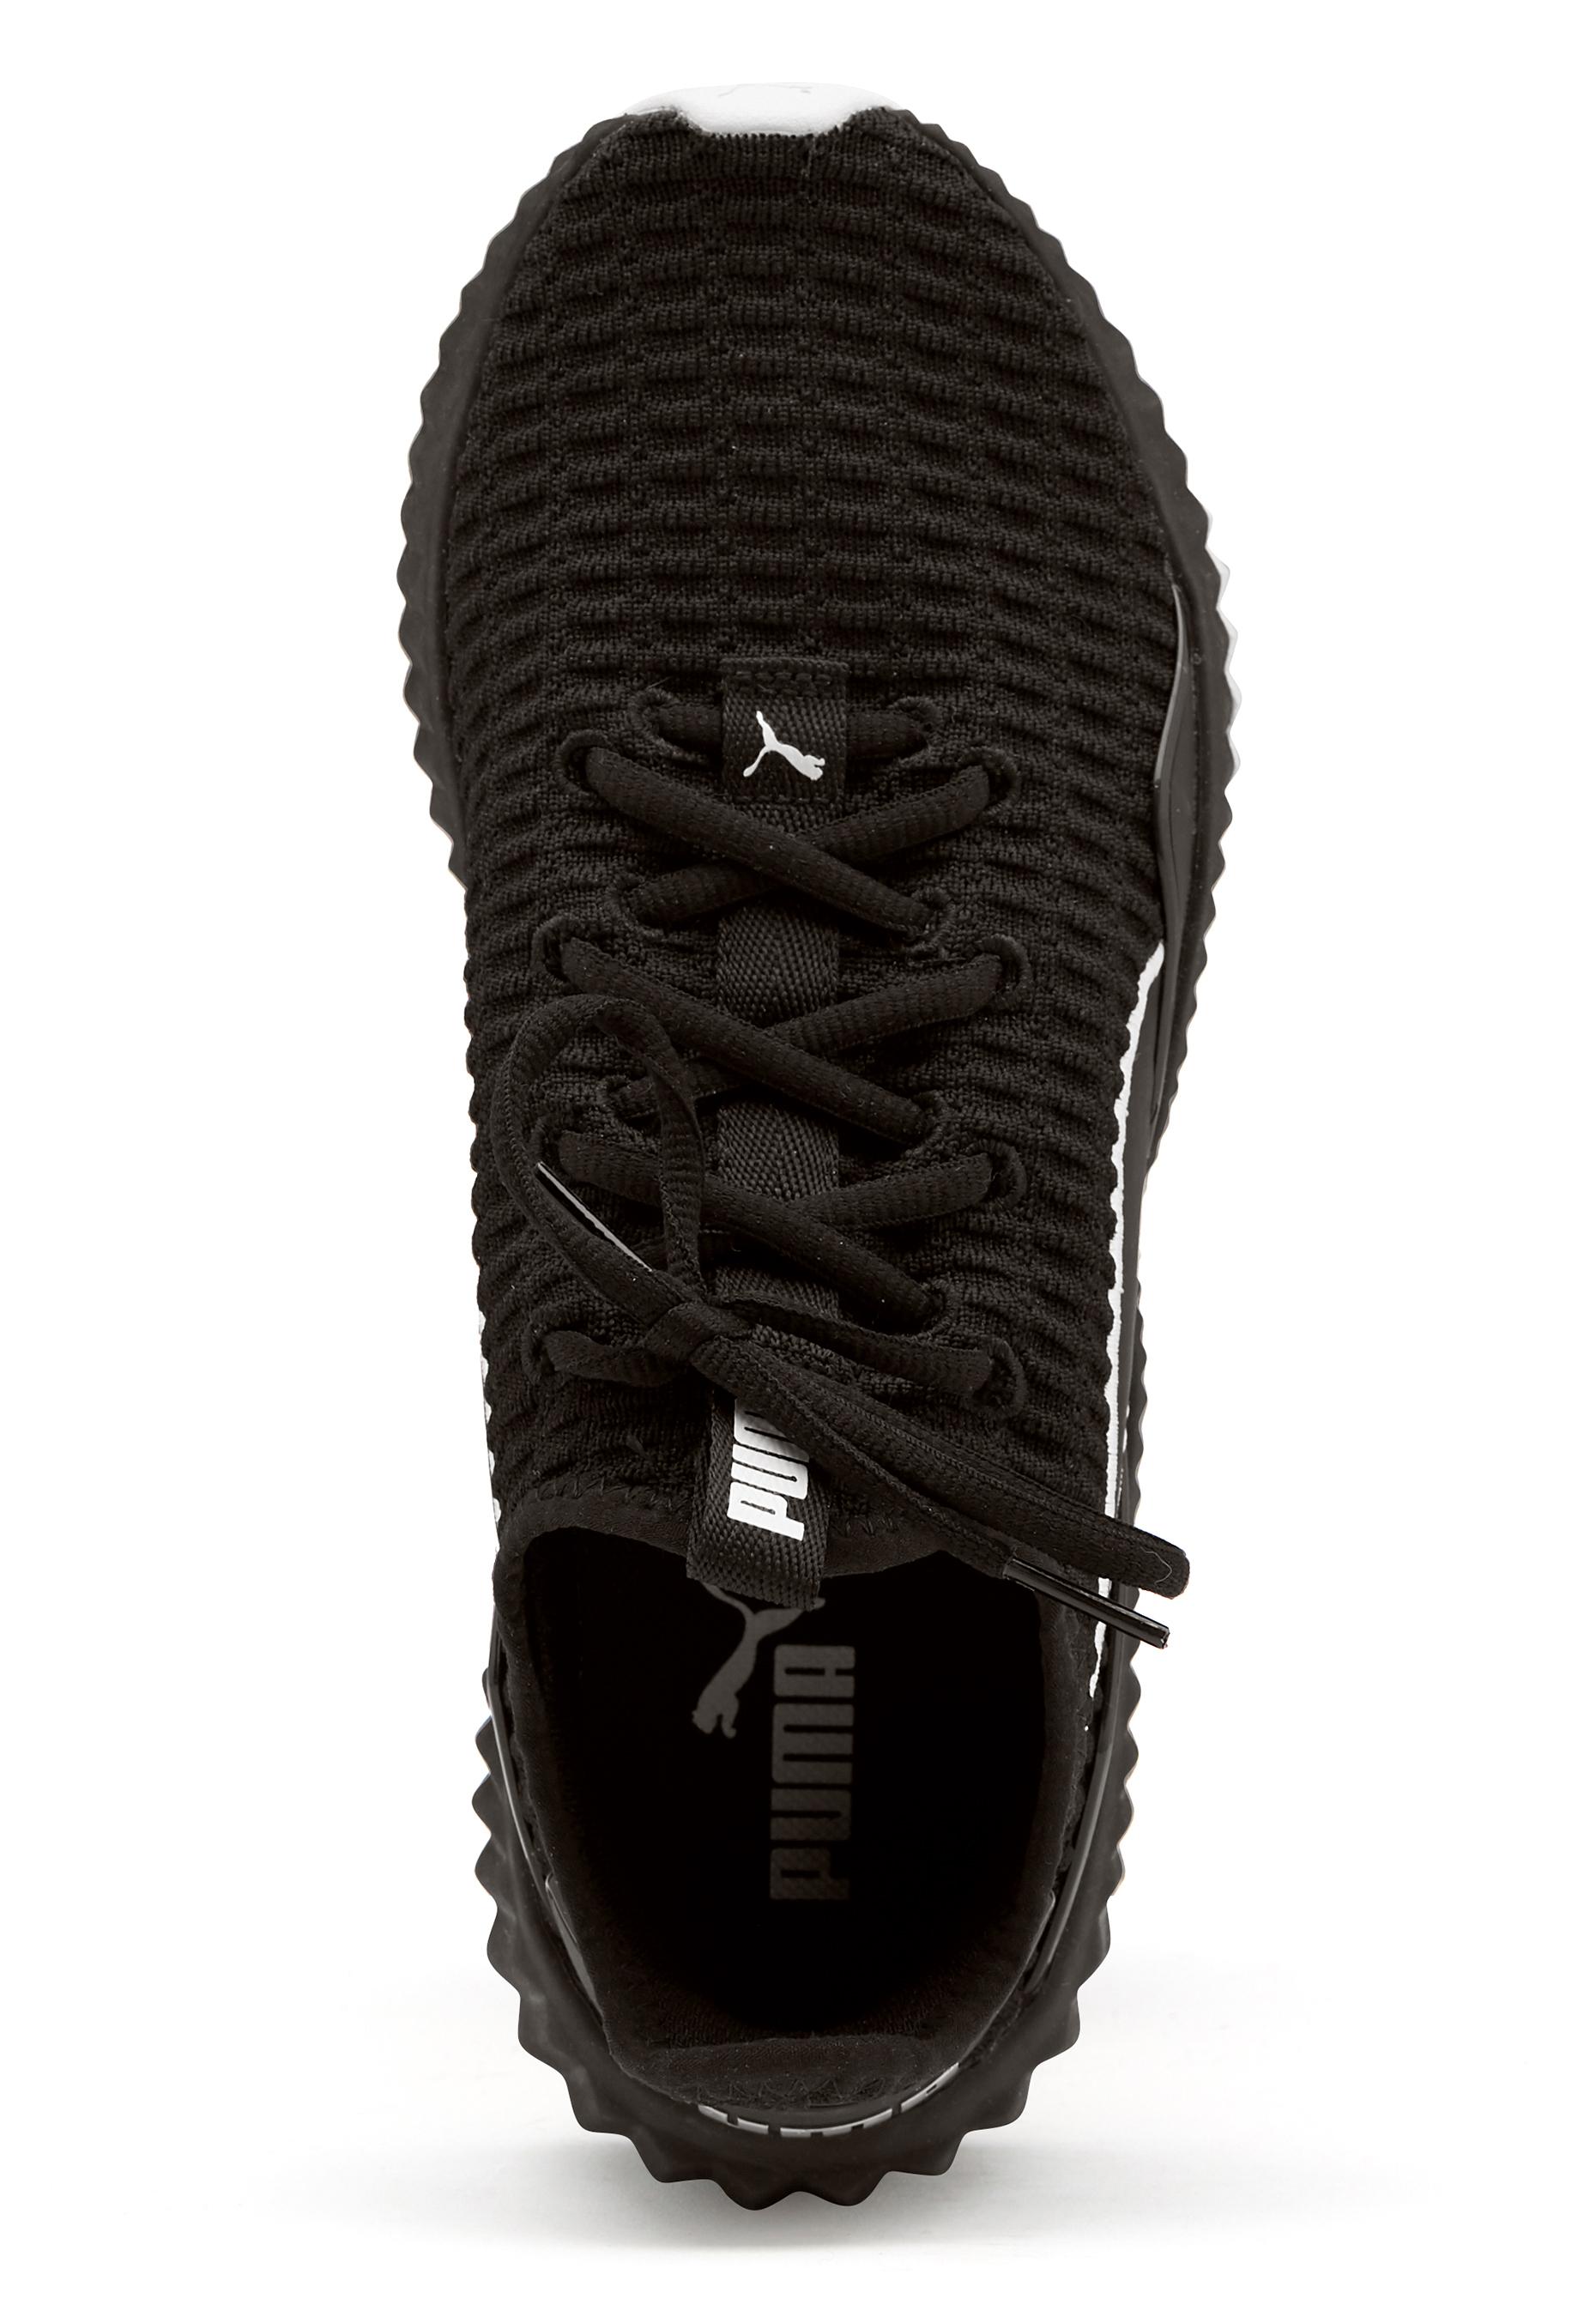 PUMA Defy Sneakers 020 Black - Bubbleroom